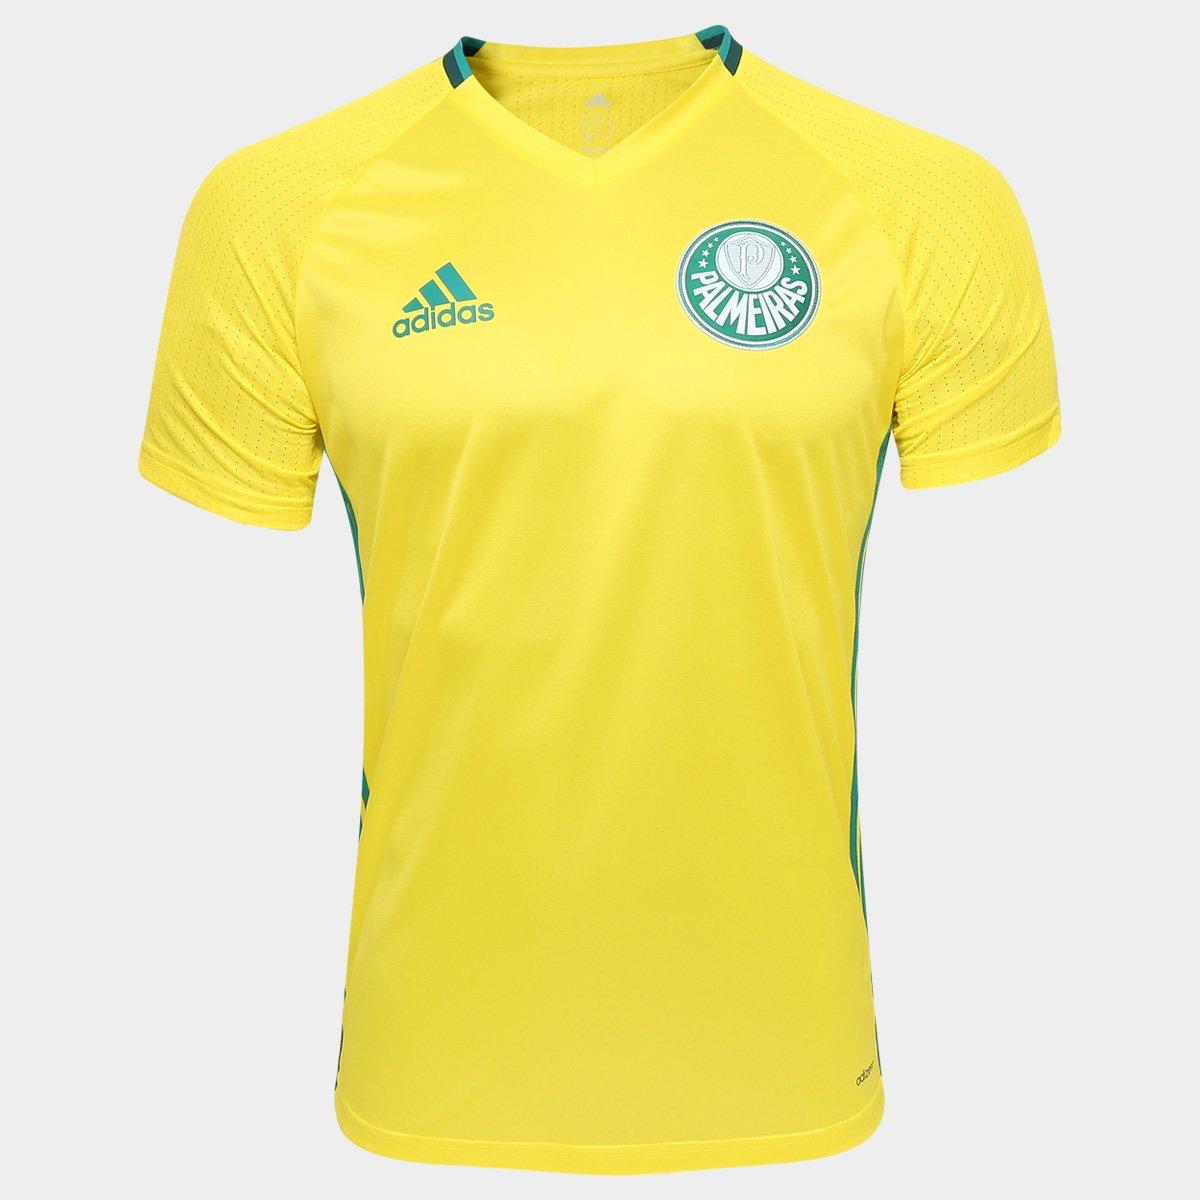 020044517 Camisa de Treino Palmeiras 2016 Adidas Masculina | Allianz Parque Shop